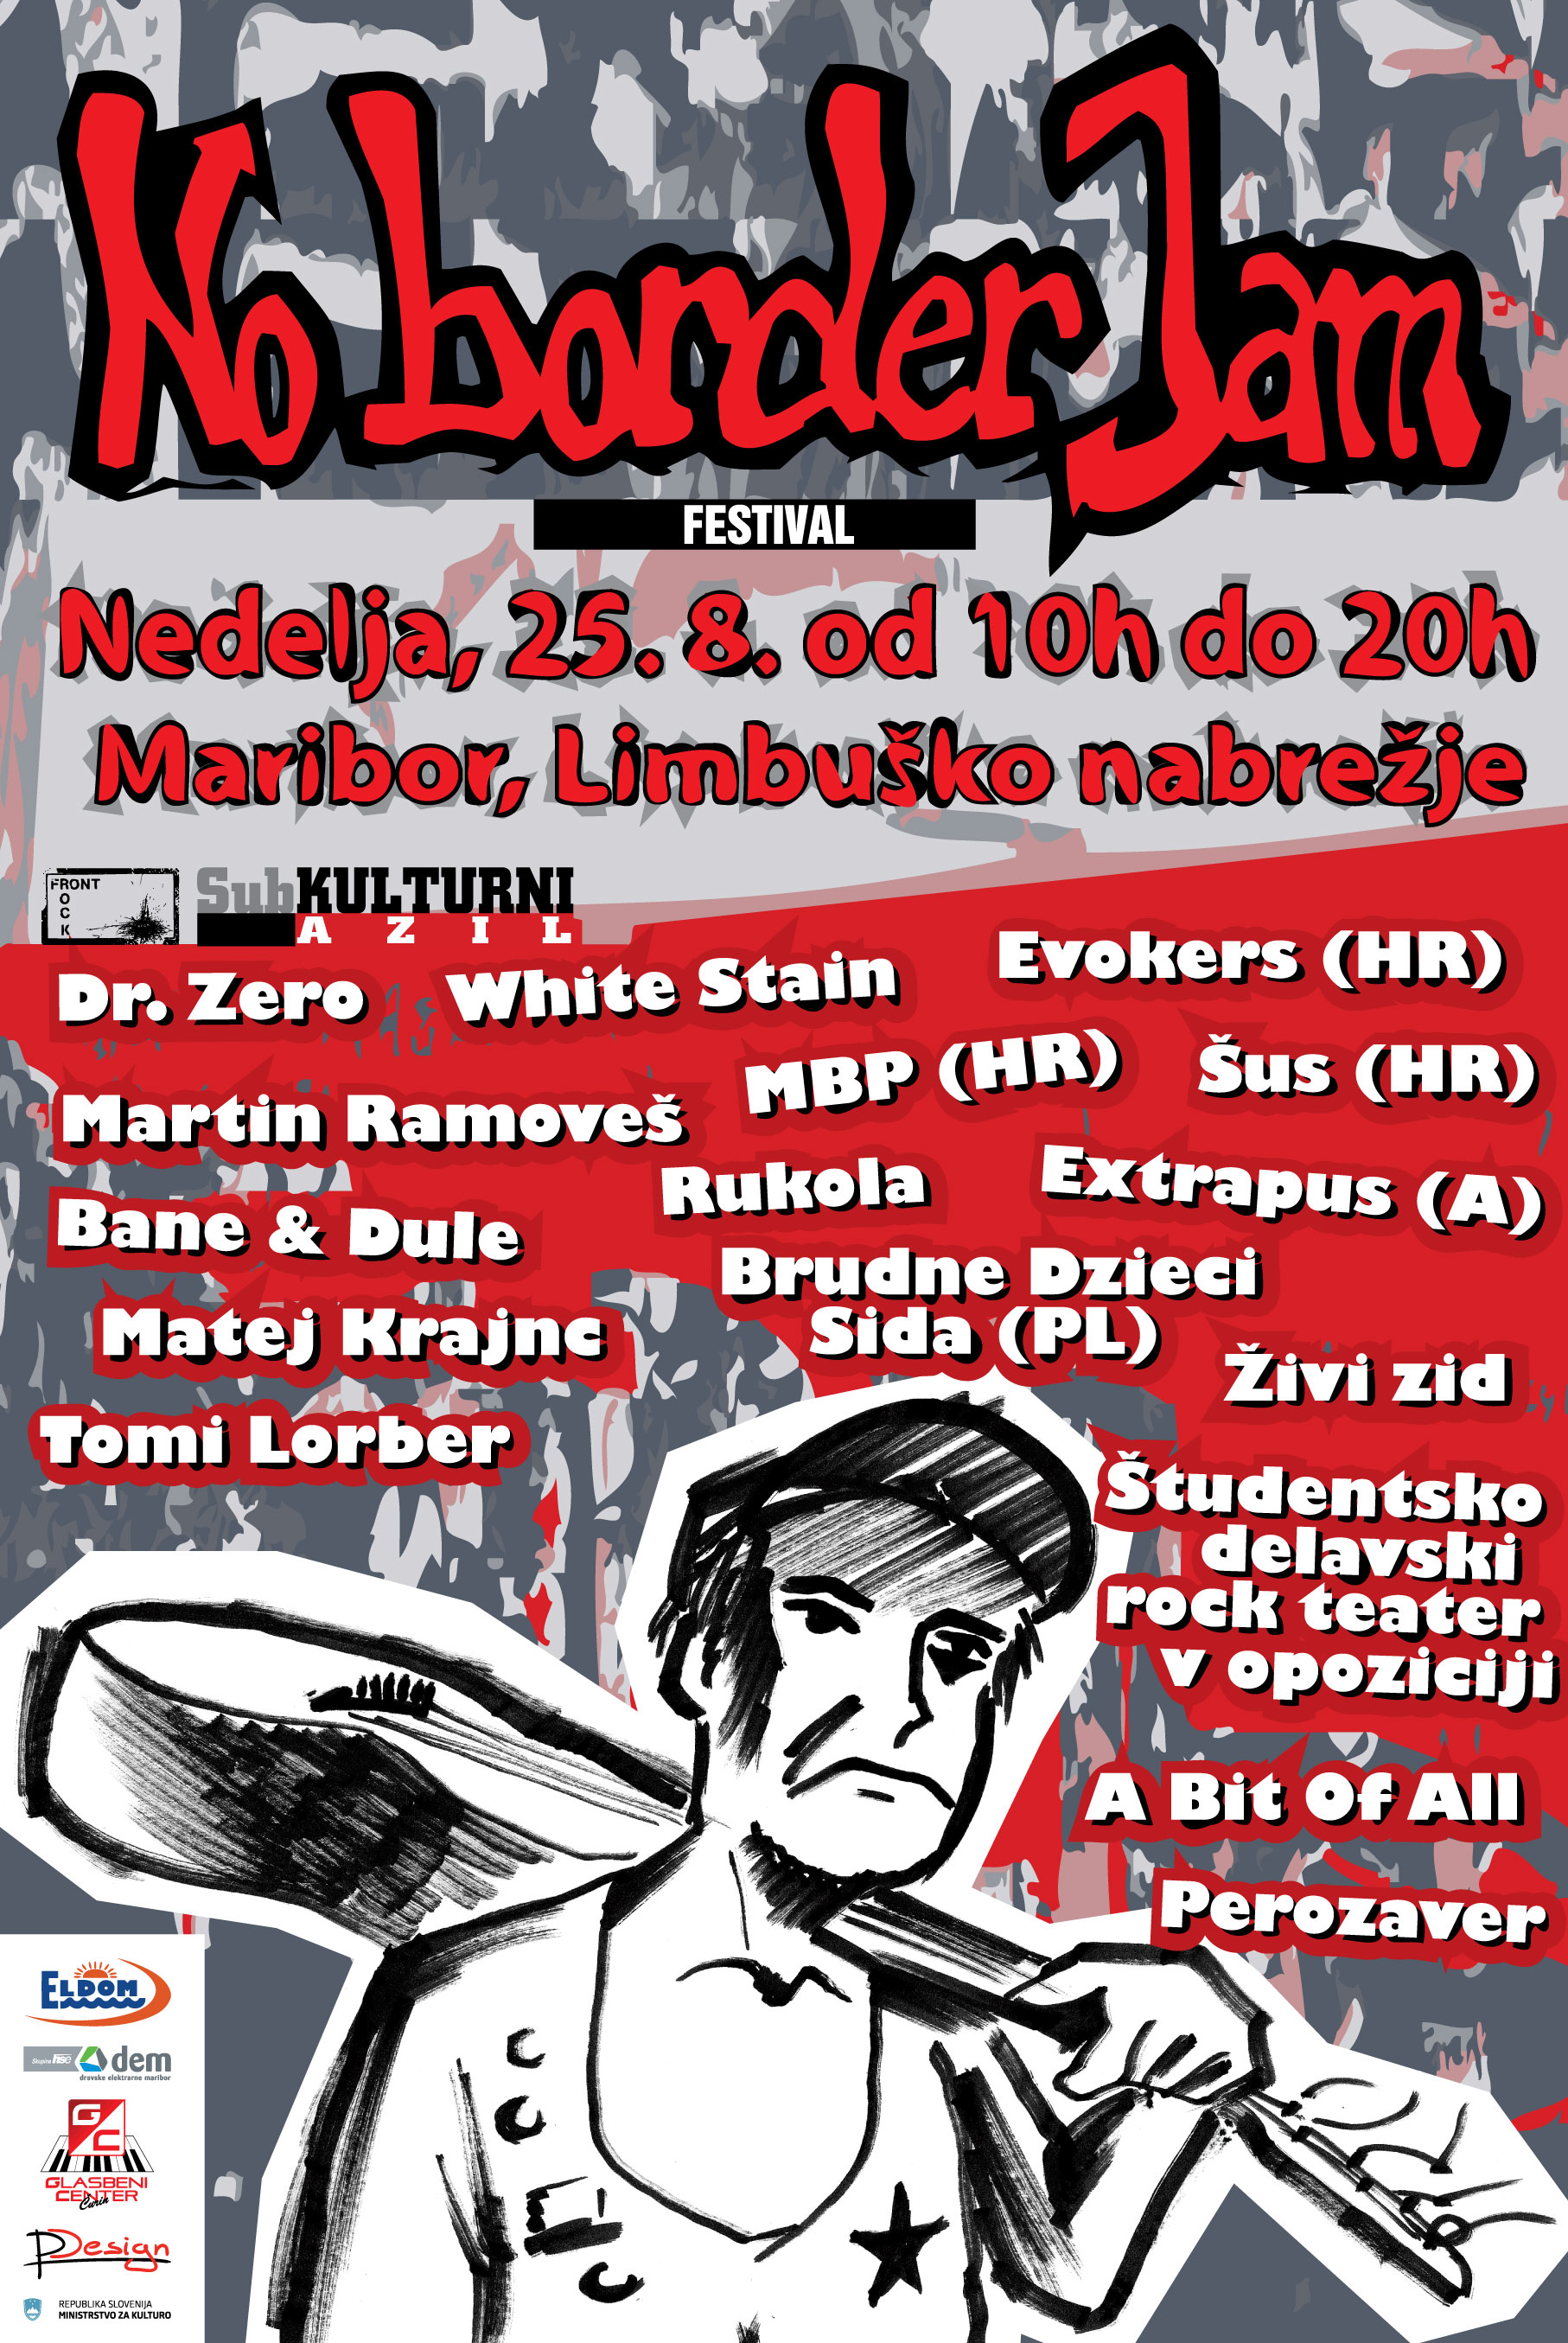 http://www.ljudmila.org/subkulturni-azil/front/img/admin/image/festivali/nbj2013/nbj2013.jpg